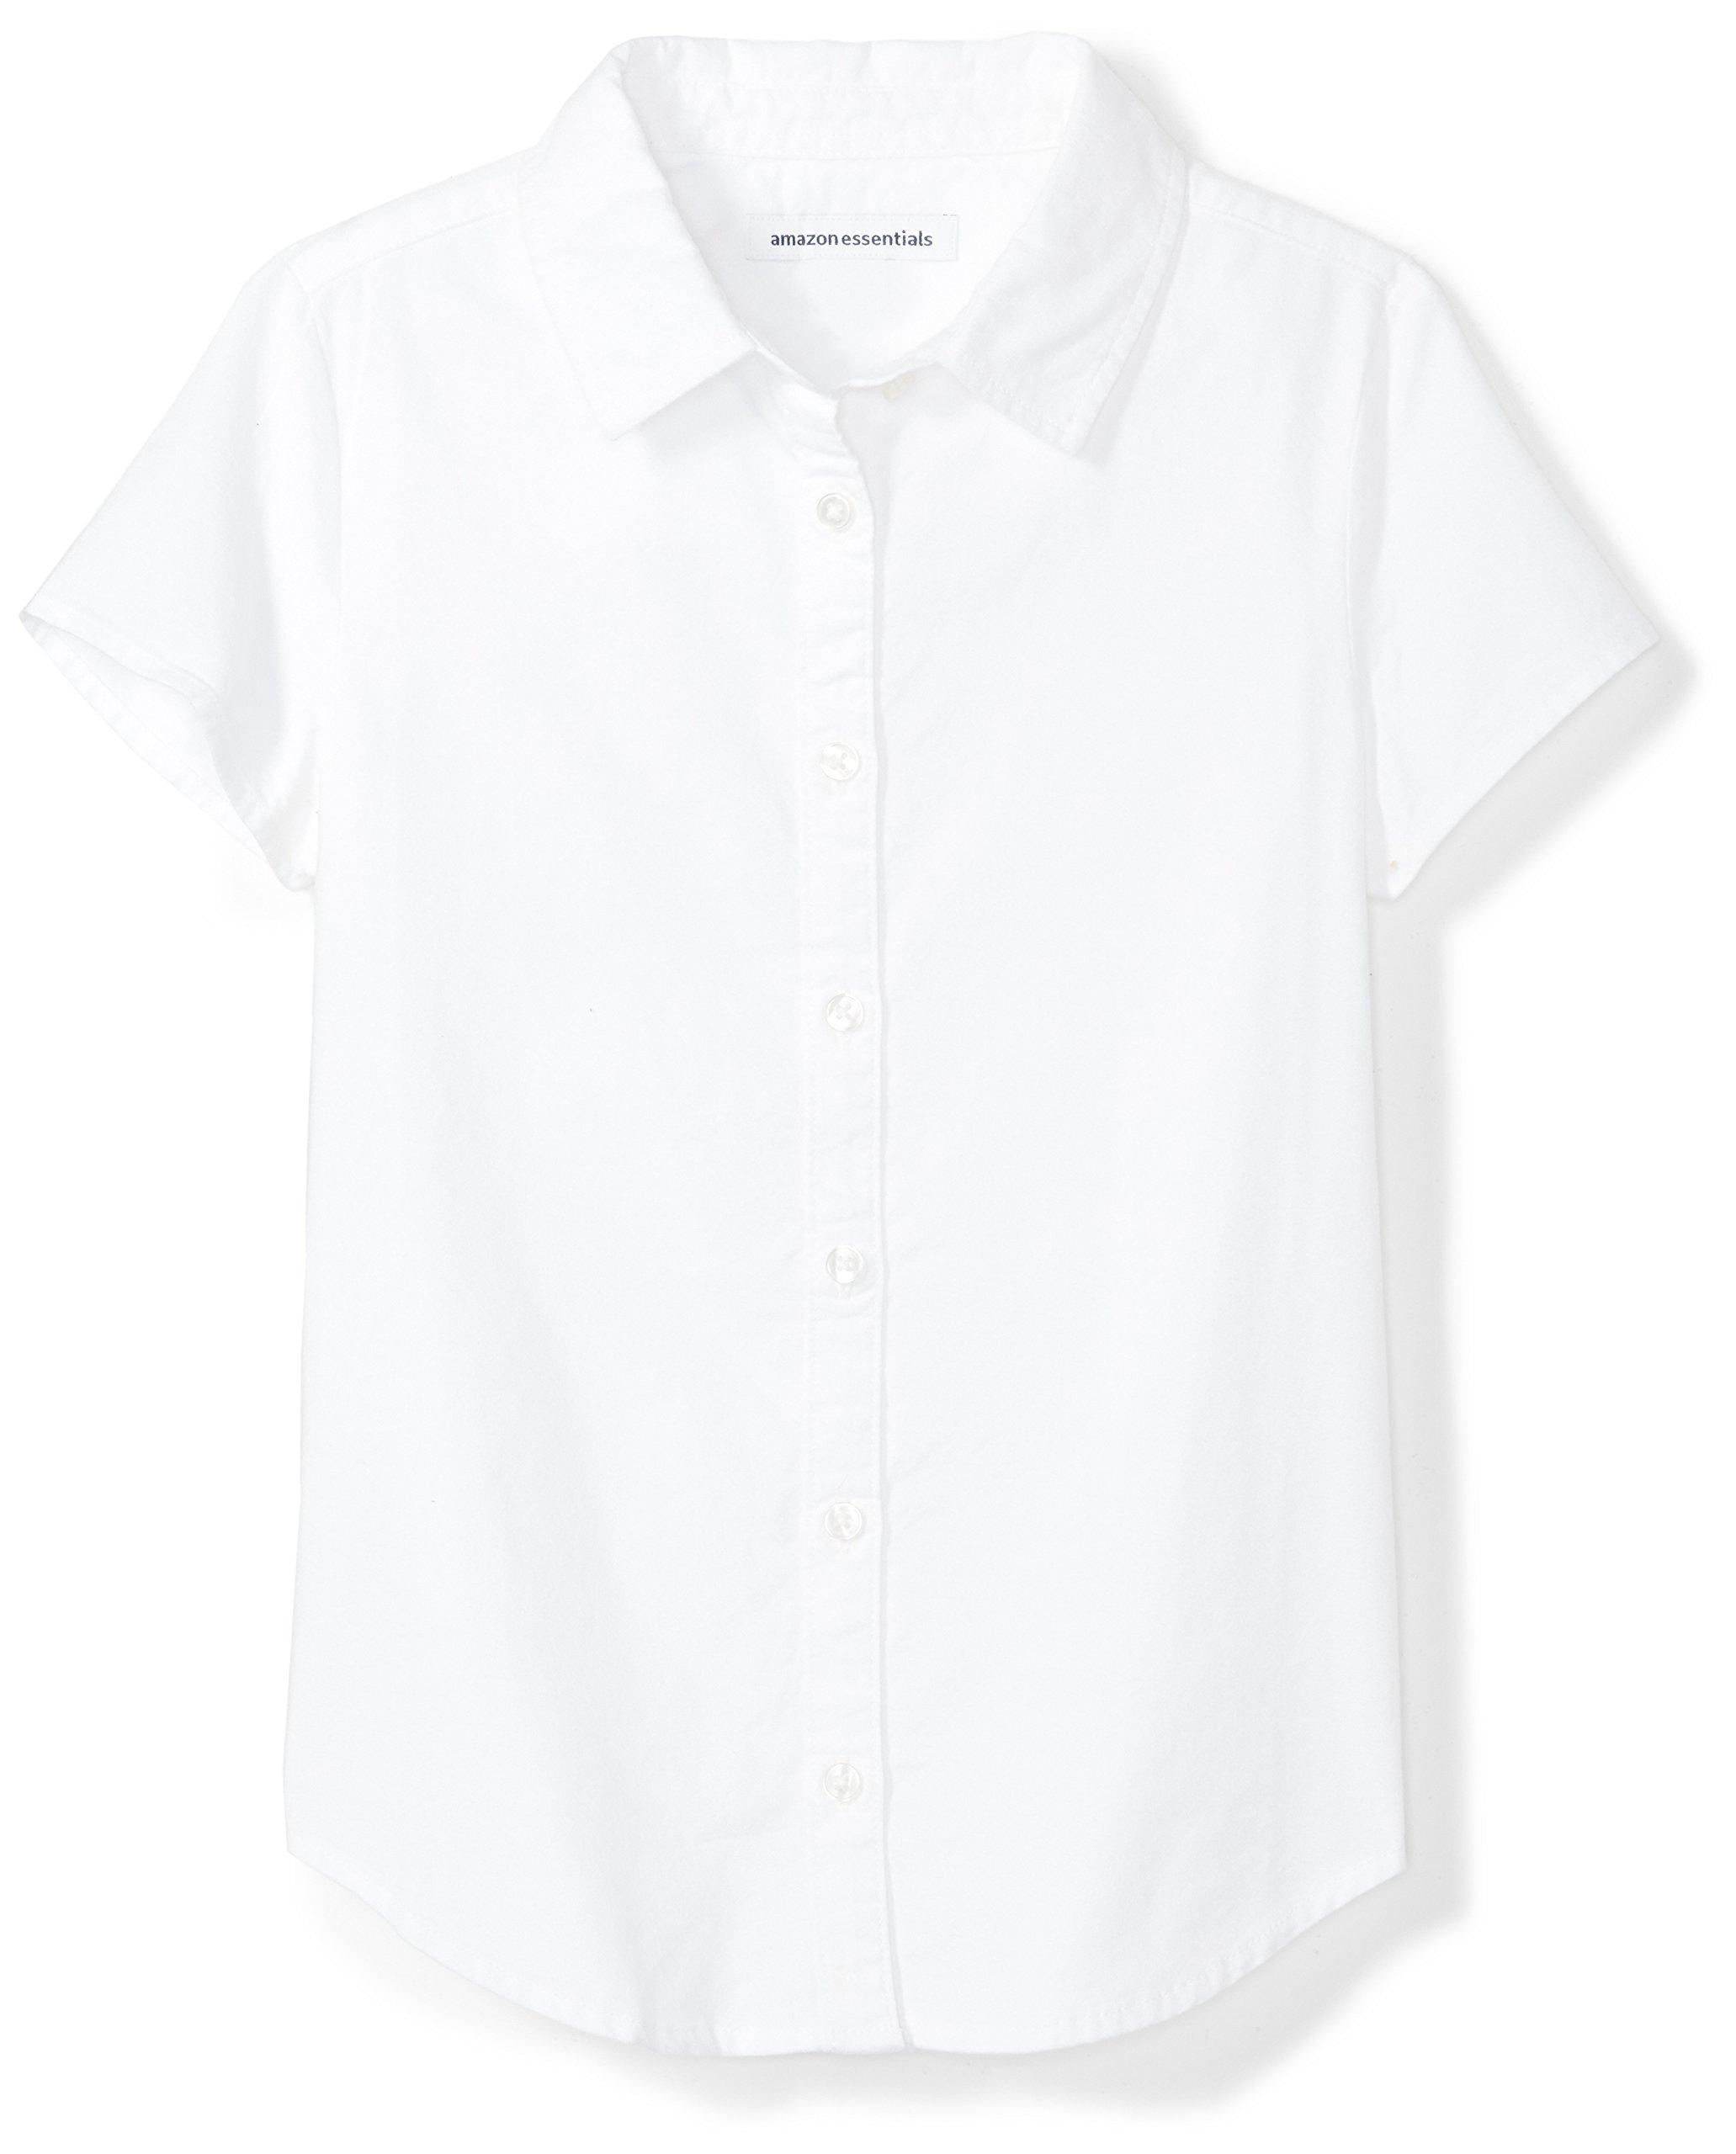 Amazon Essentials Girls' Short Sleeve Uniform Oxford Shirt, White, XS (4-5)